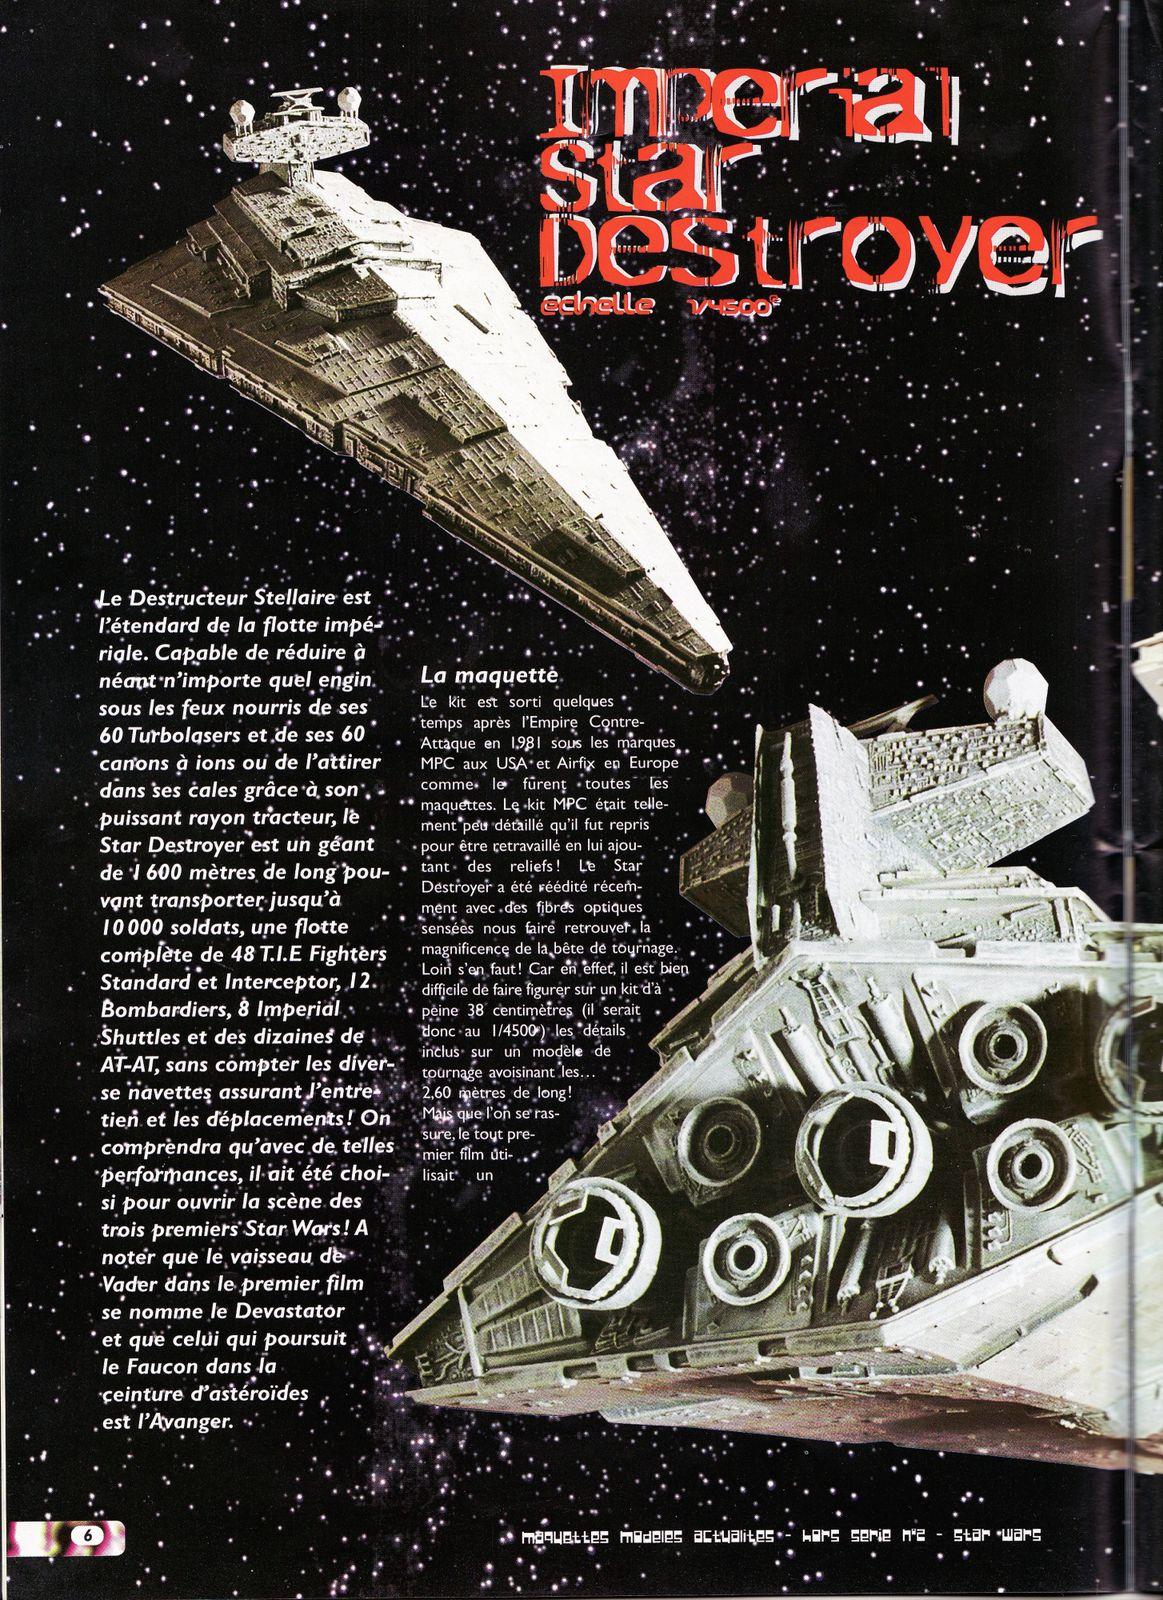 13 imperial star destroyer 1